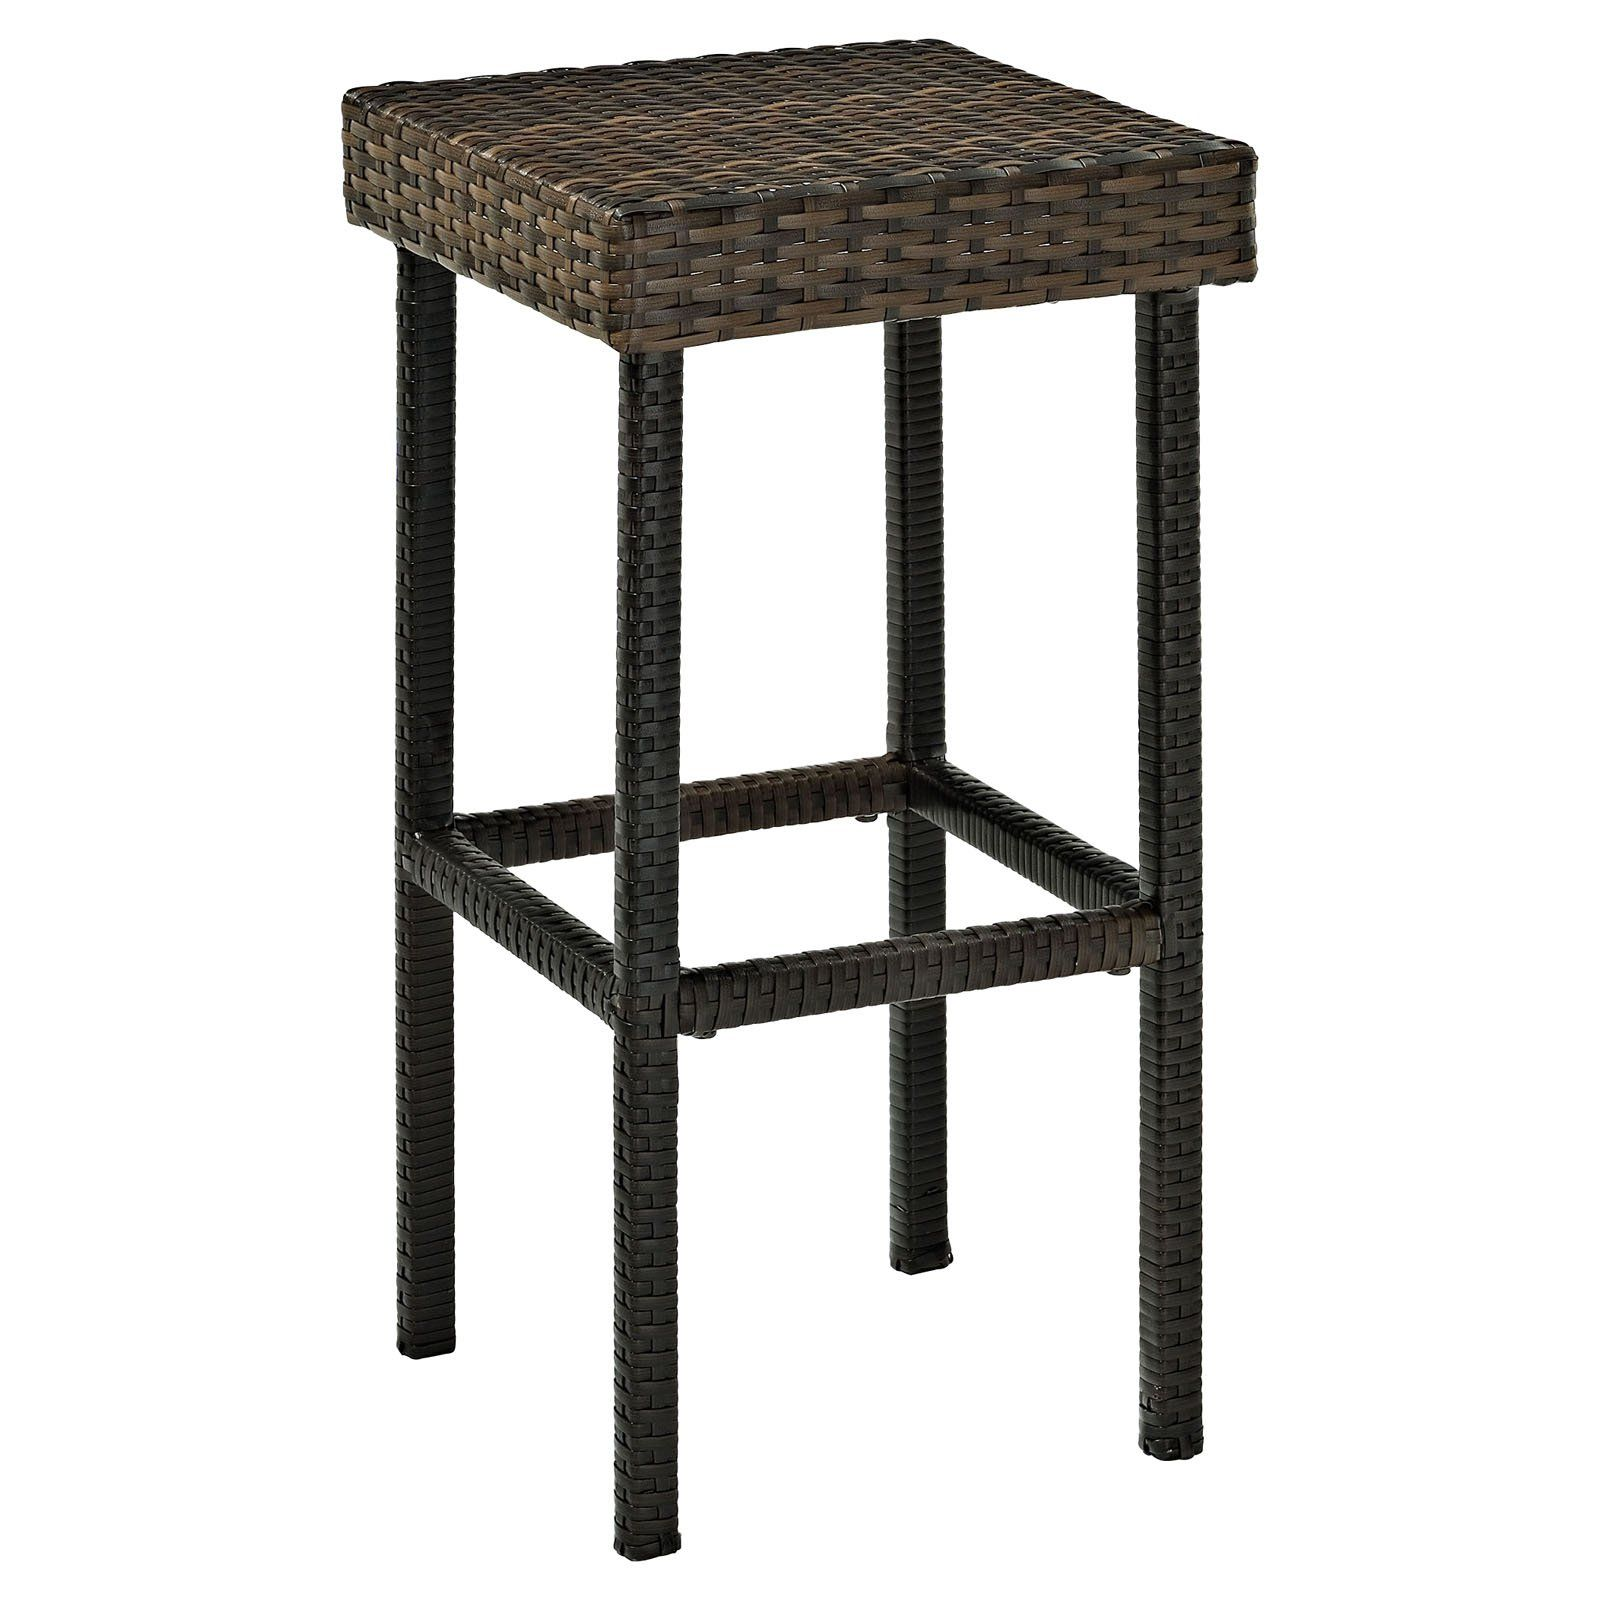 crosley palm harbor bar stool set of 2 transform your backyard